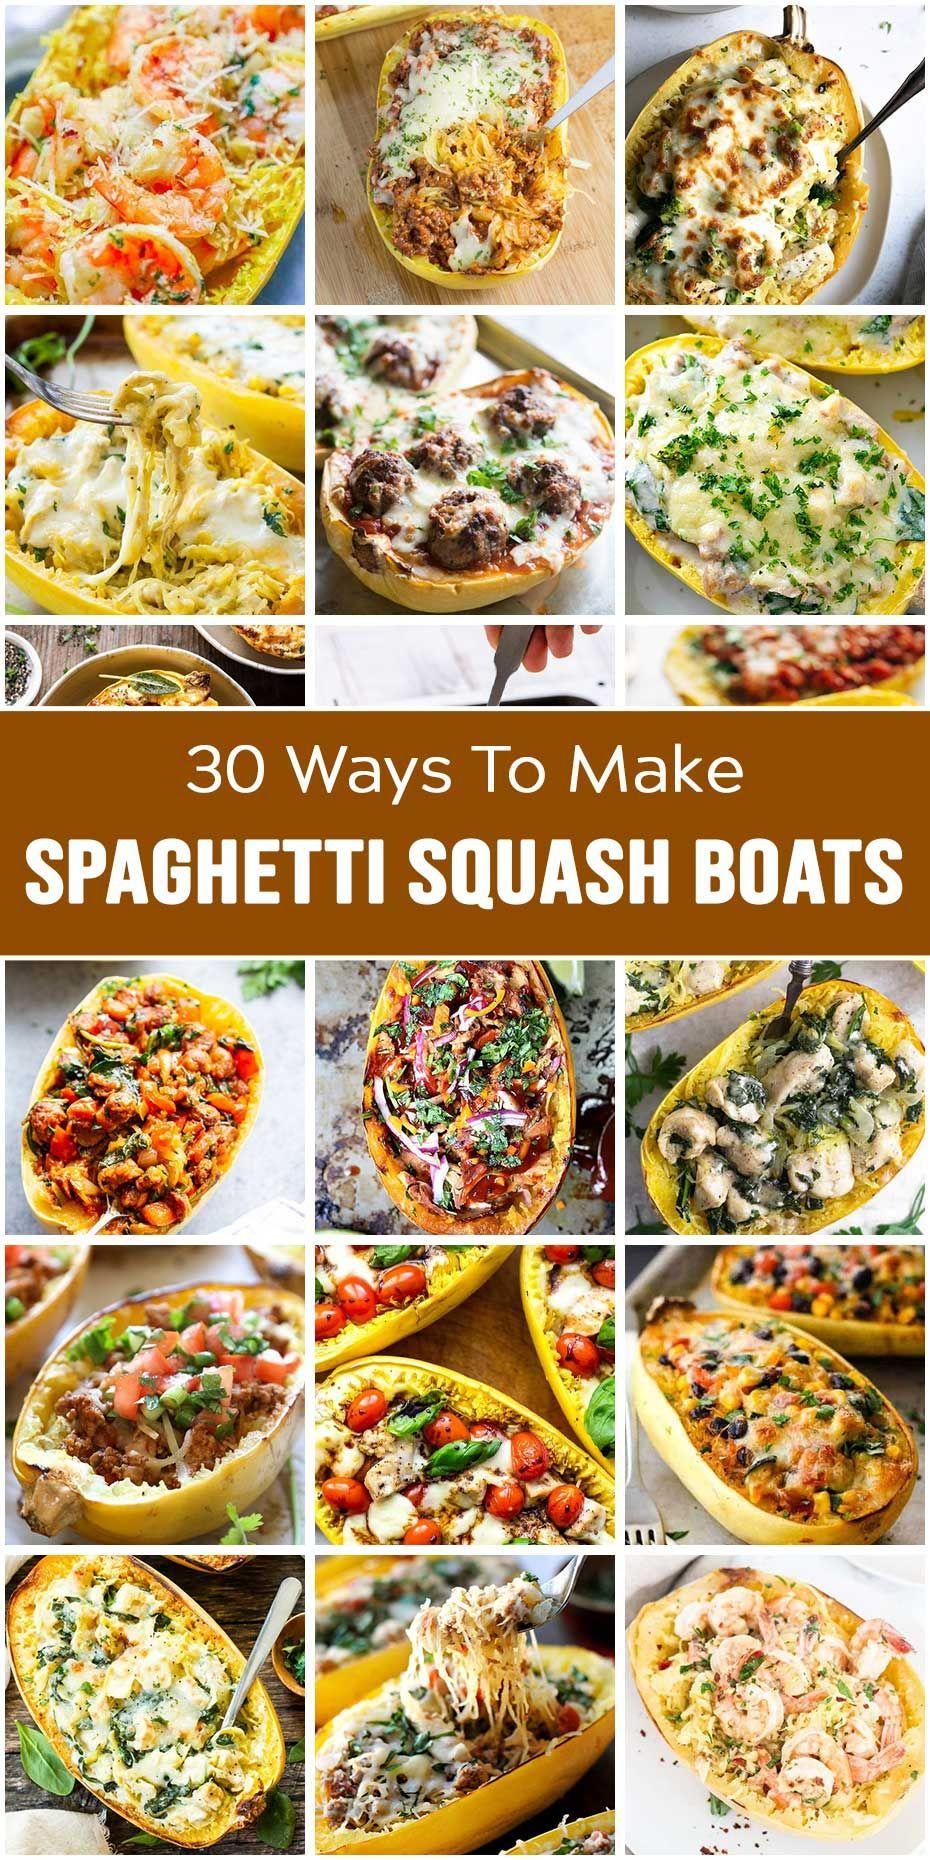 Spaghetti Squash Boats: Crazy Good Food For Meals #stuffedspaghettisquash Spaghetti Squash Boats: Crazy Good Food For Meals #stuffedspaghettisquash